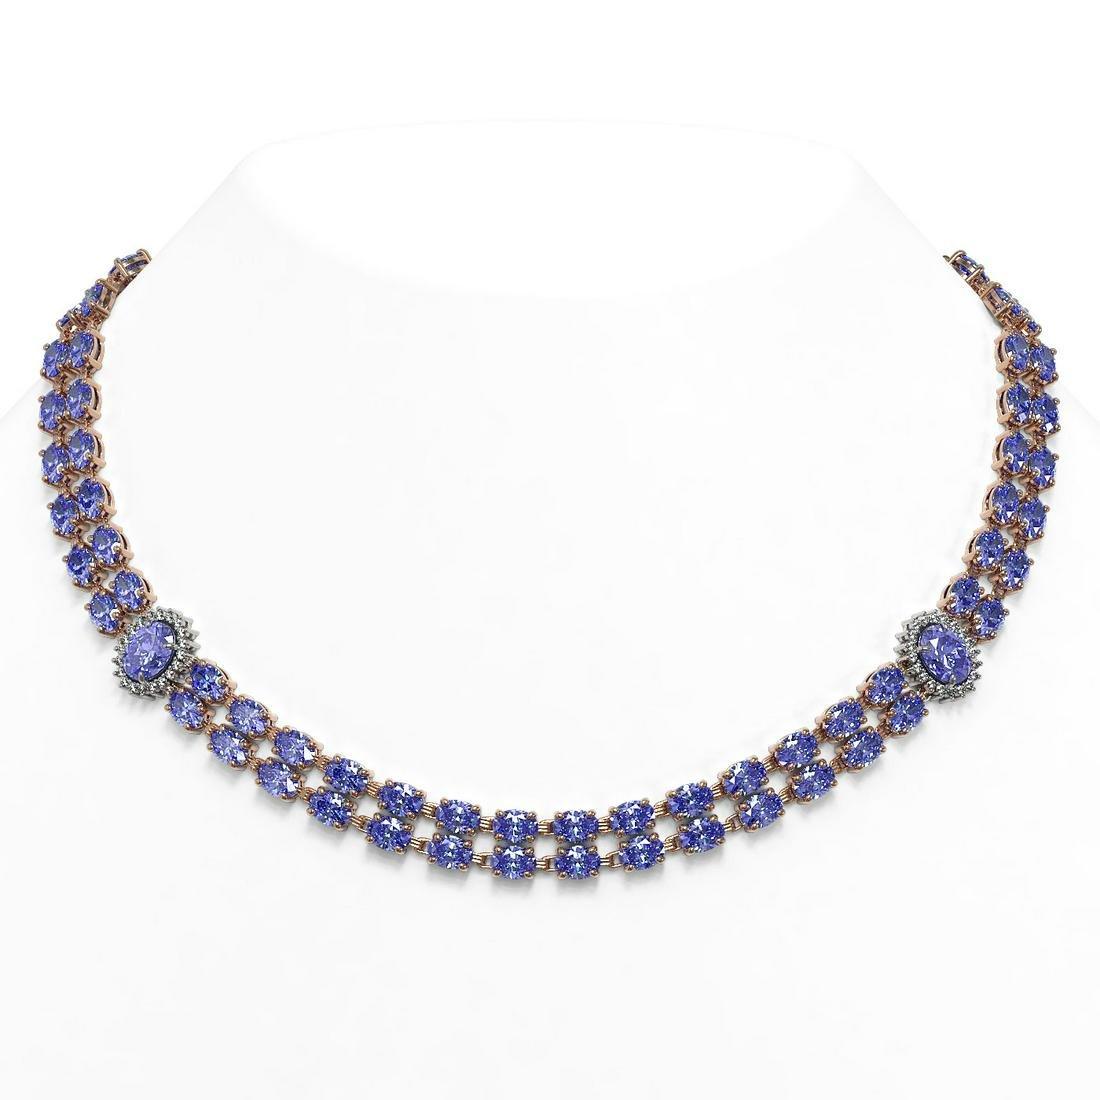 62.77 ctw Tanzanite & Diamond Necklace 14K Rose Gold